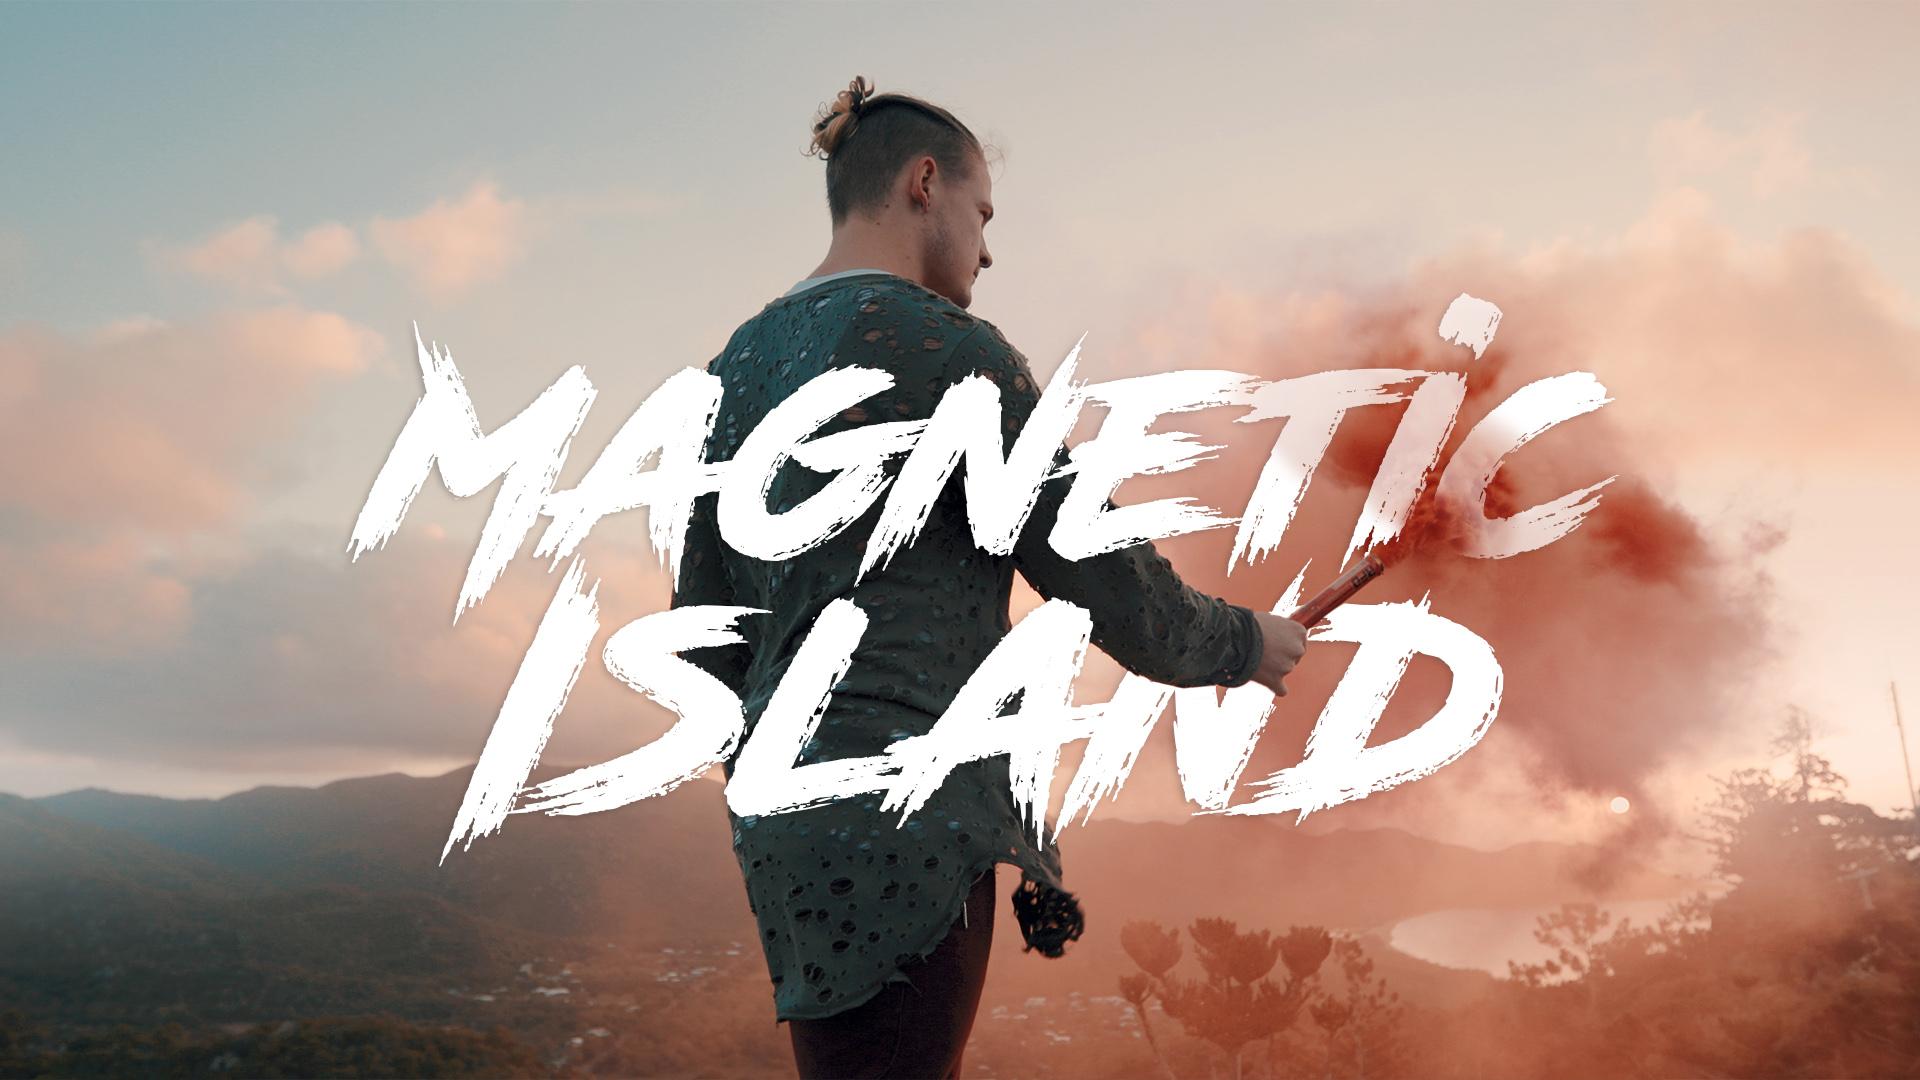 Magnetic Island Thumbnail (No Boarder).jpg